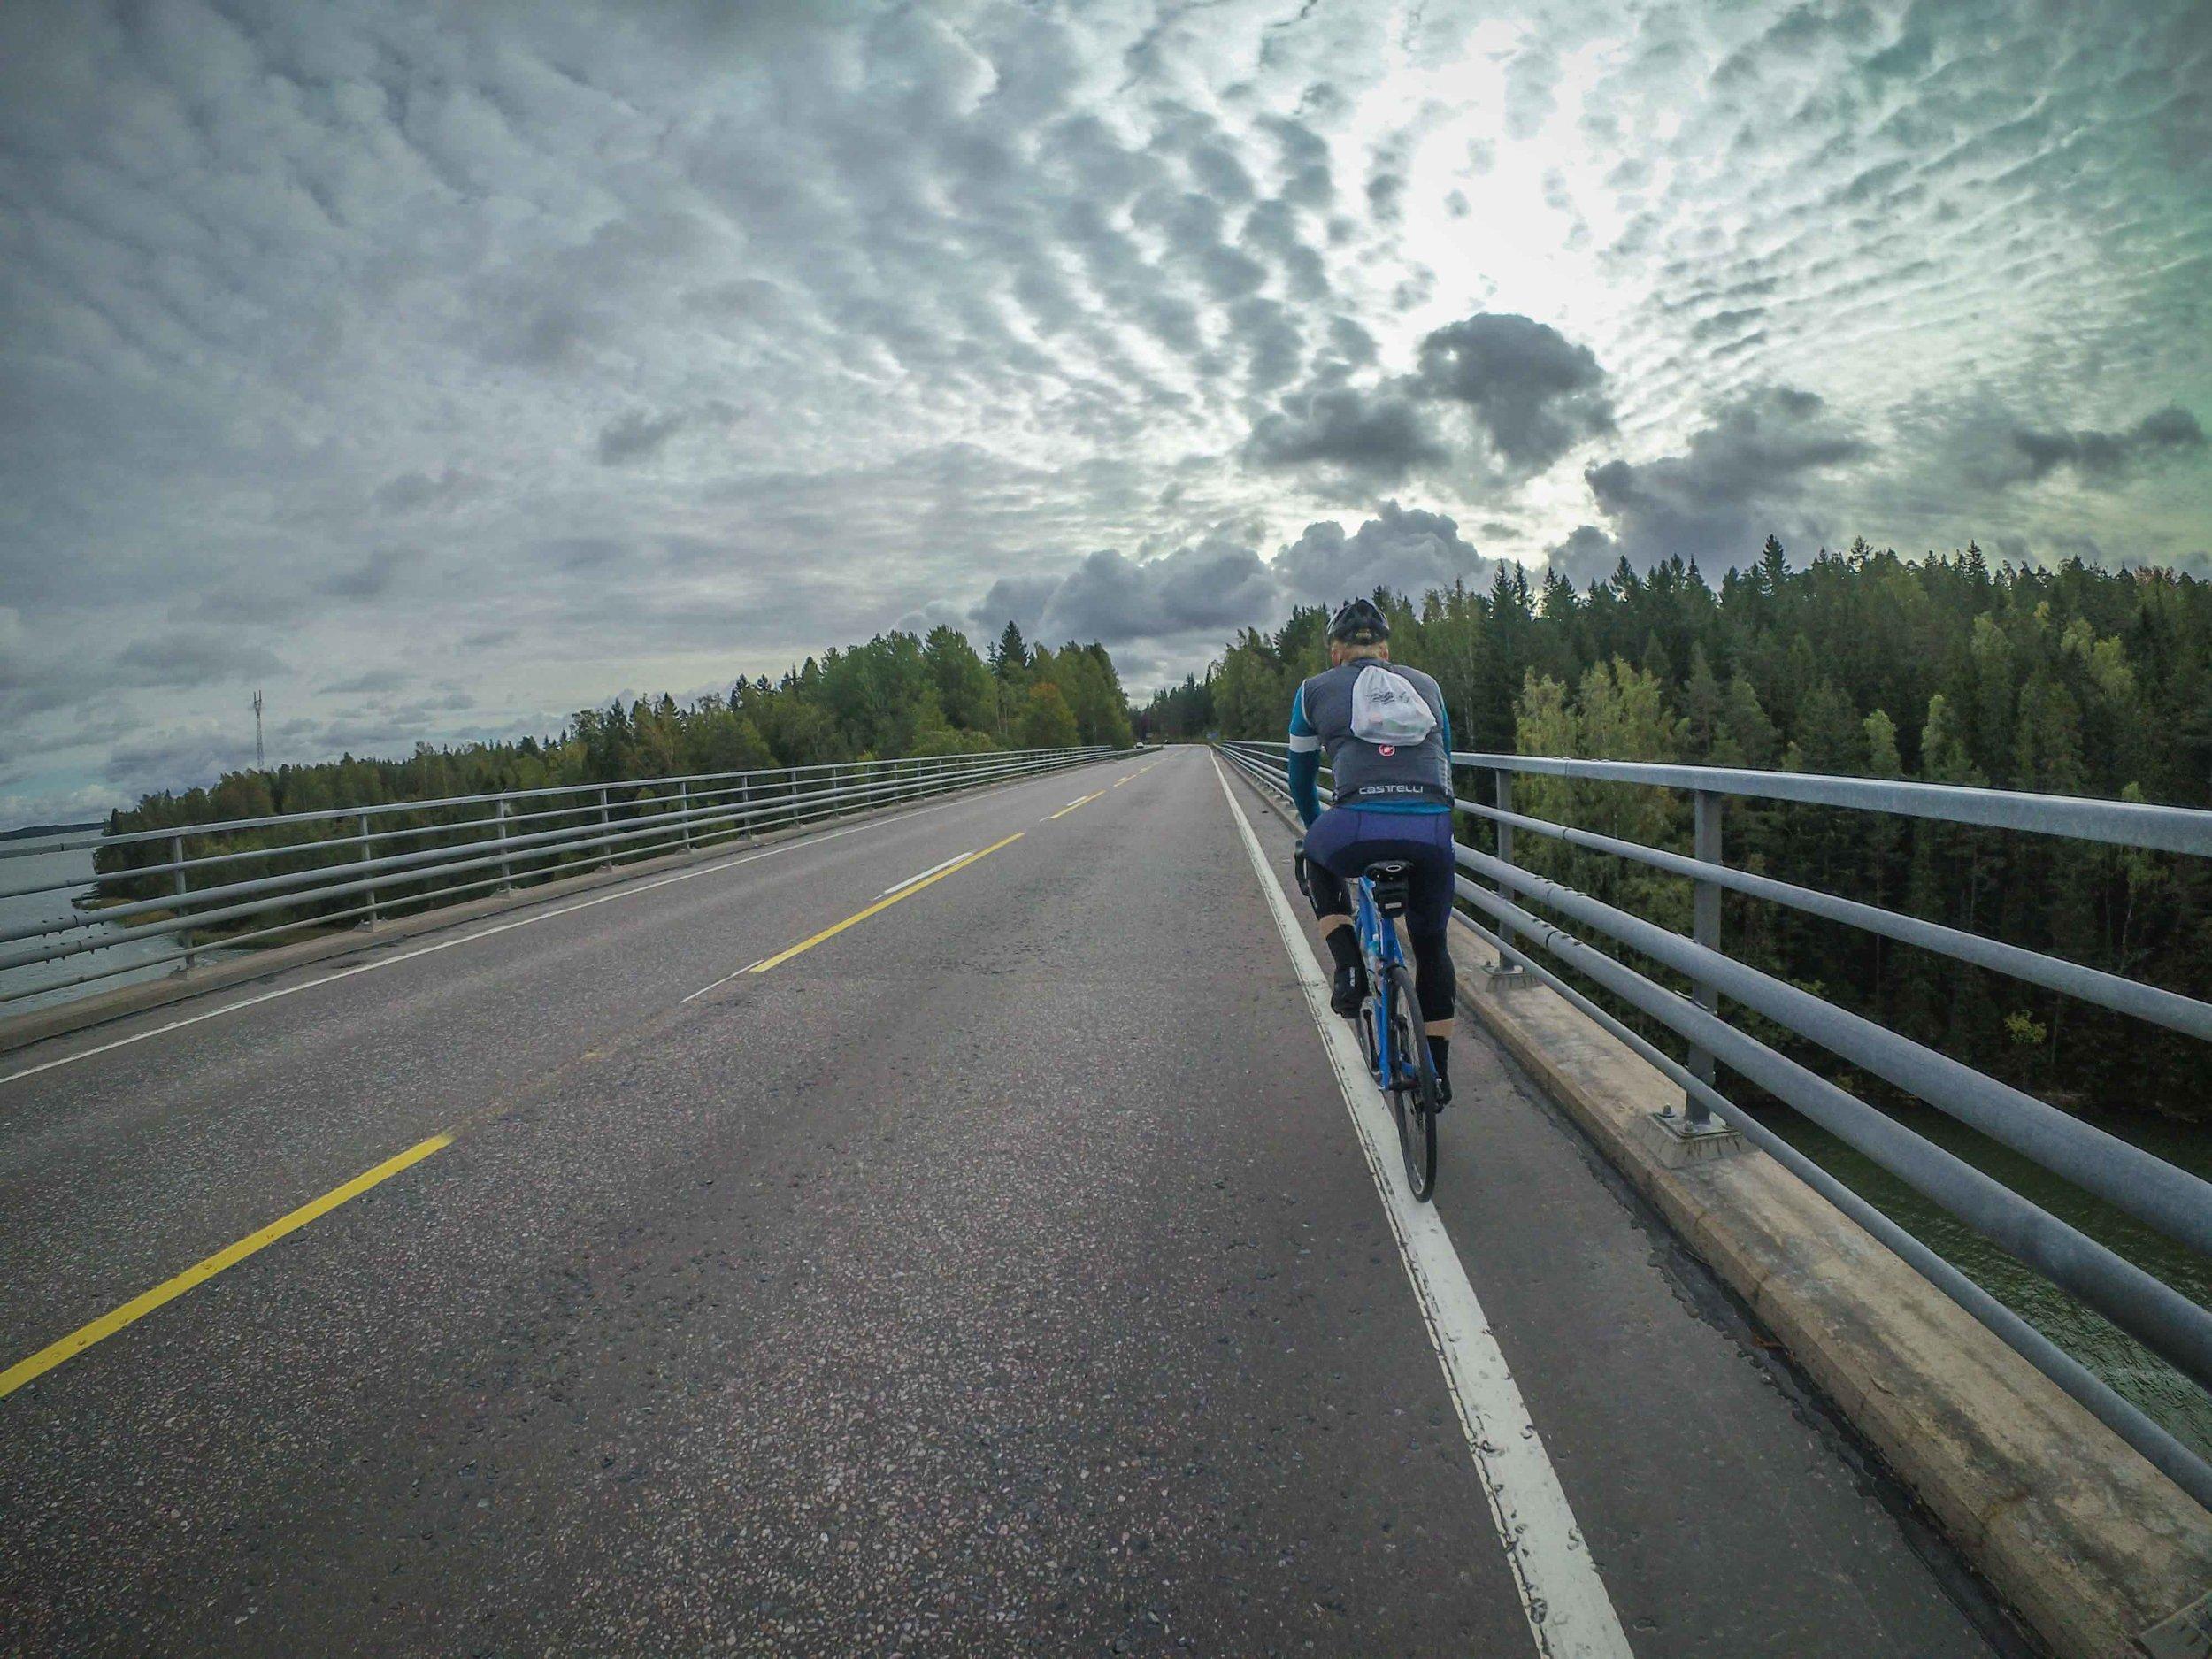 Crossing the bridge to Kimitoön